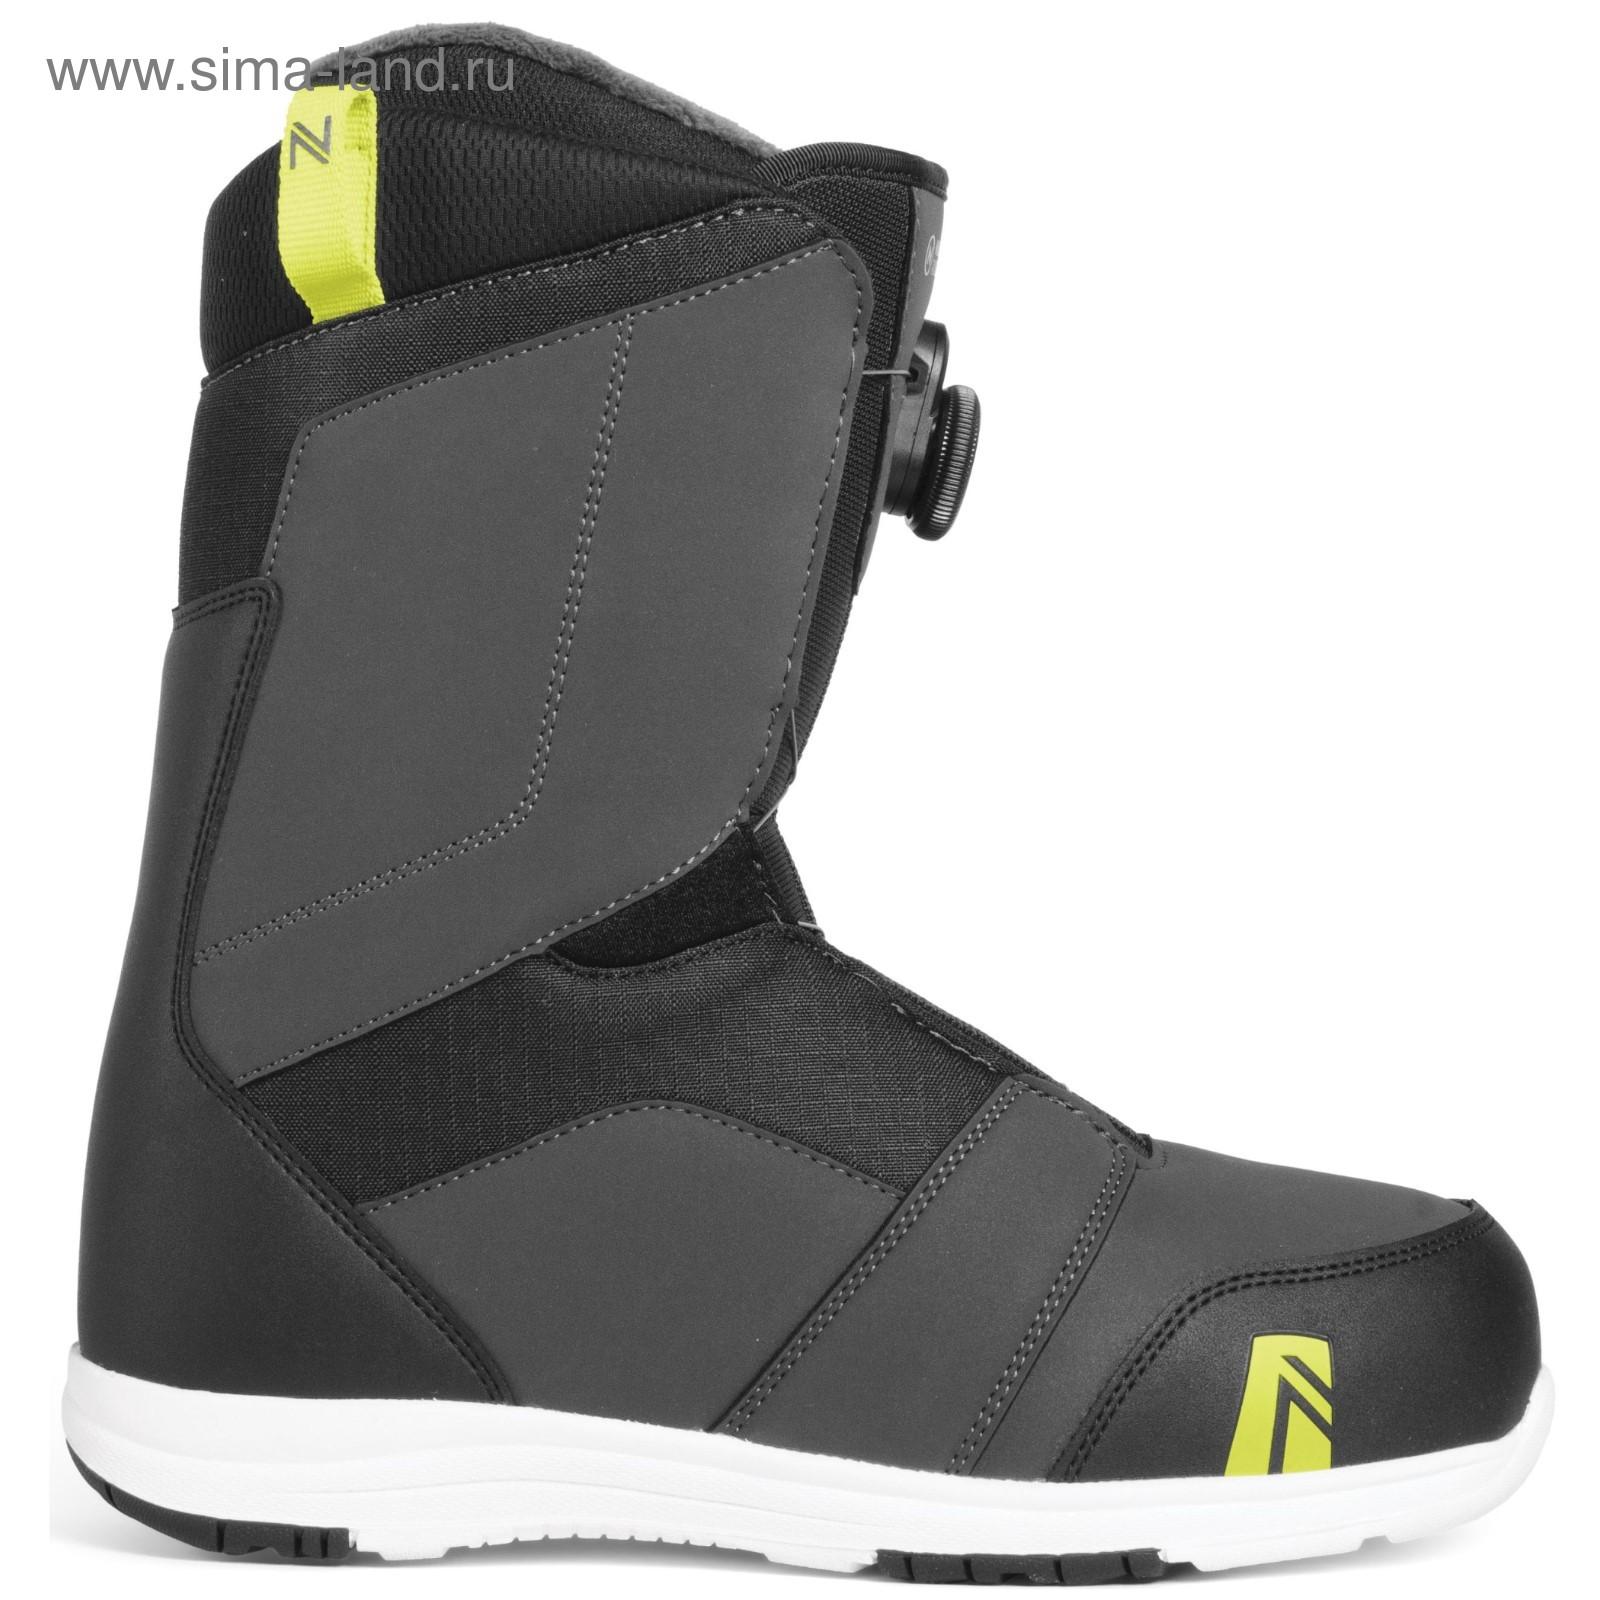 50e4c535a71d Ботинки для сноуборда NIDECKER 2018-19 Ranger Boa Charcoal, размер ...